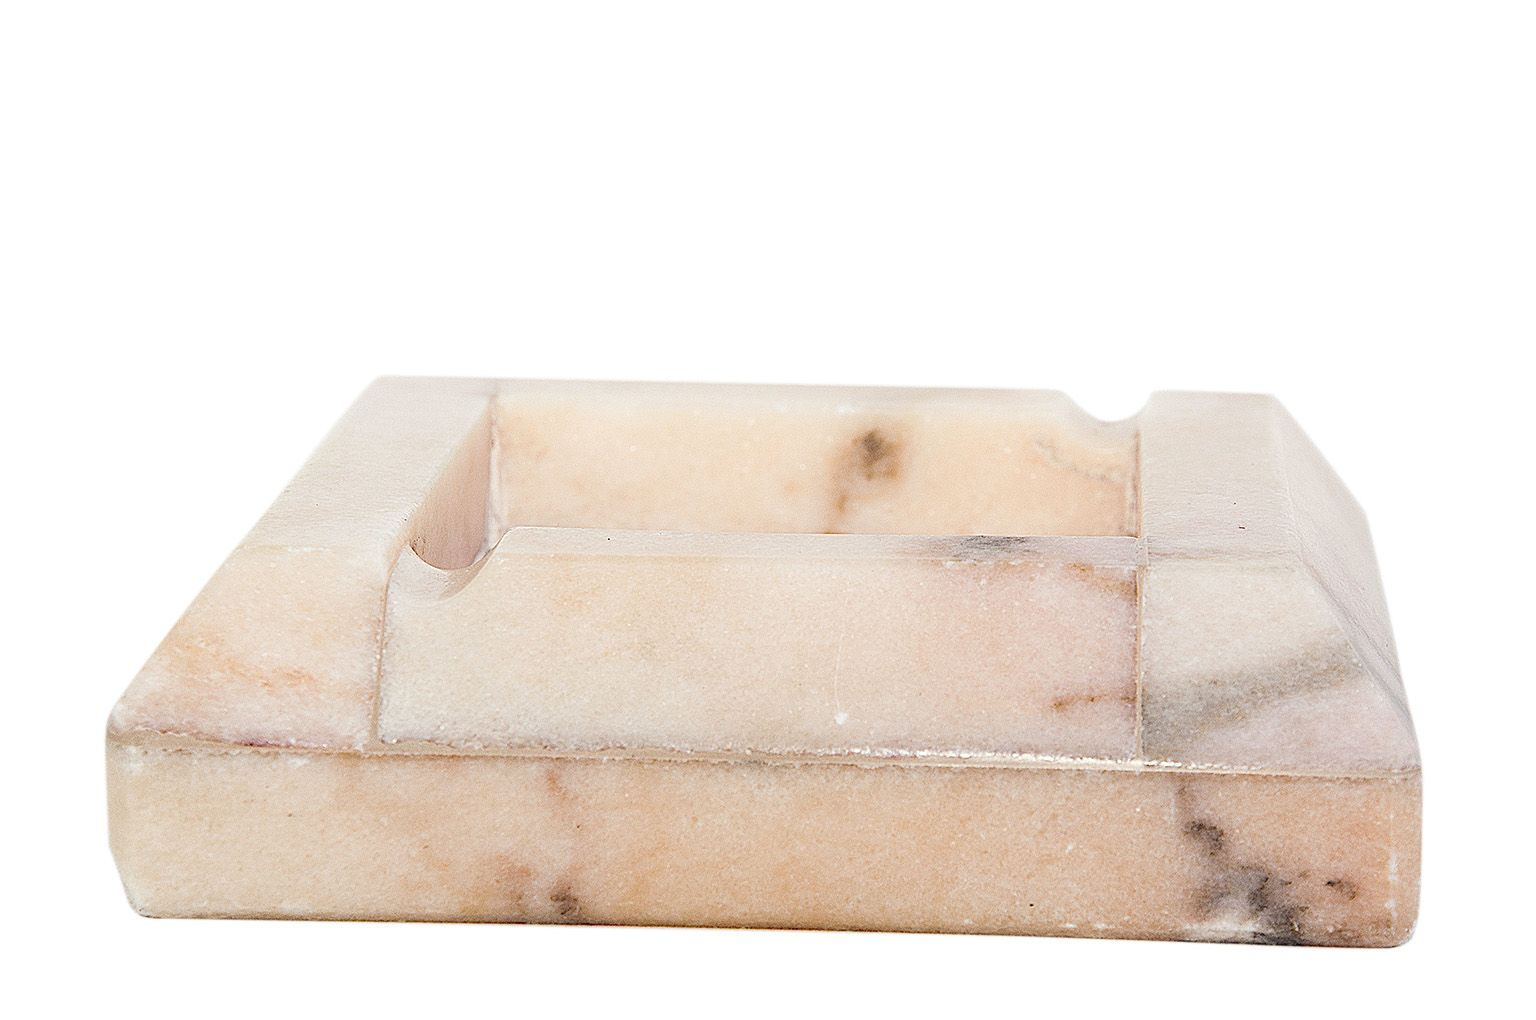 cendrier vintage en marbre italie en vente sur pamono. Black Bedroom Furniture Sets. Home Design Ideas